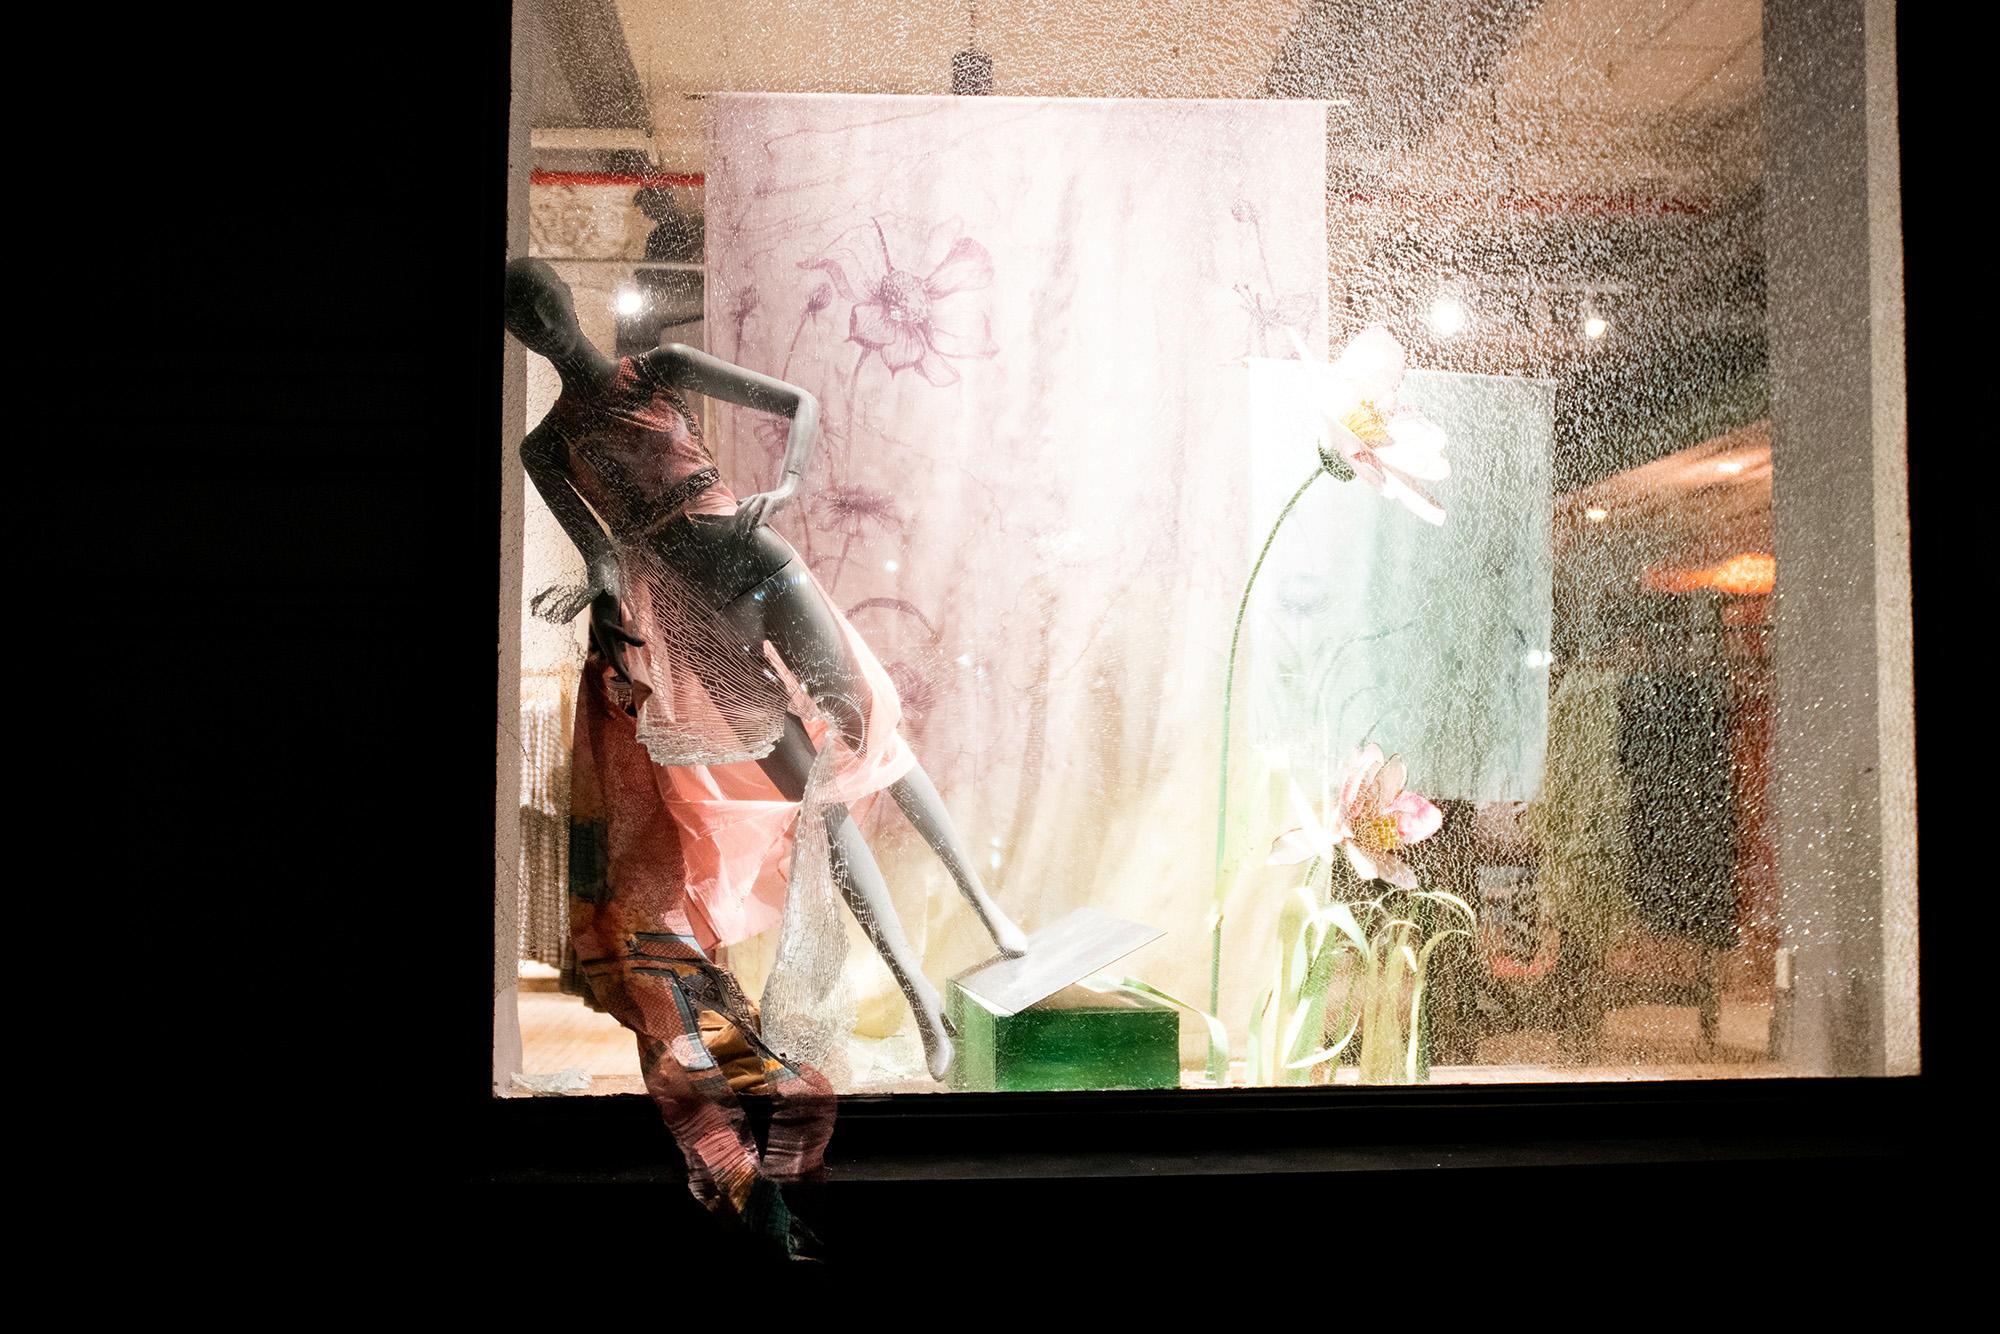 Разрушенная витрина магазина наМанхэттене, Нью-Йорк